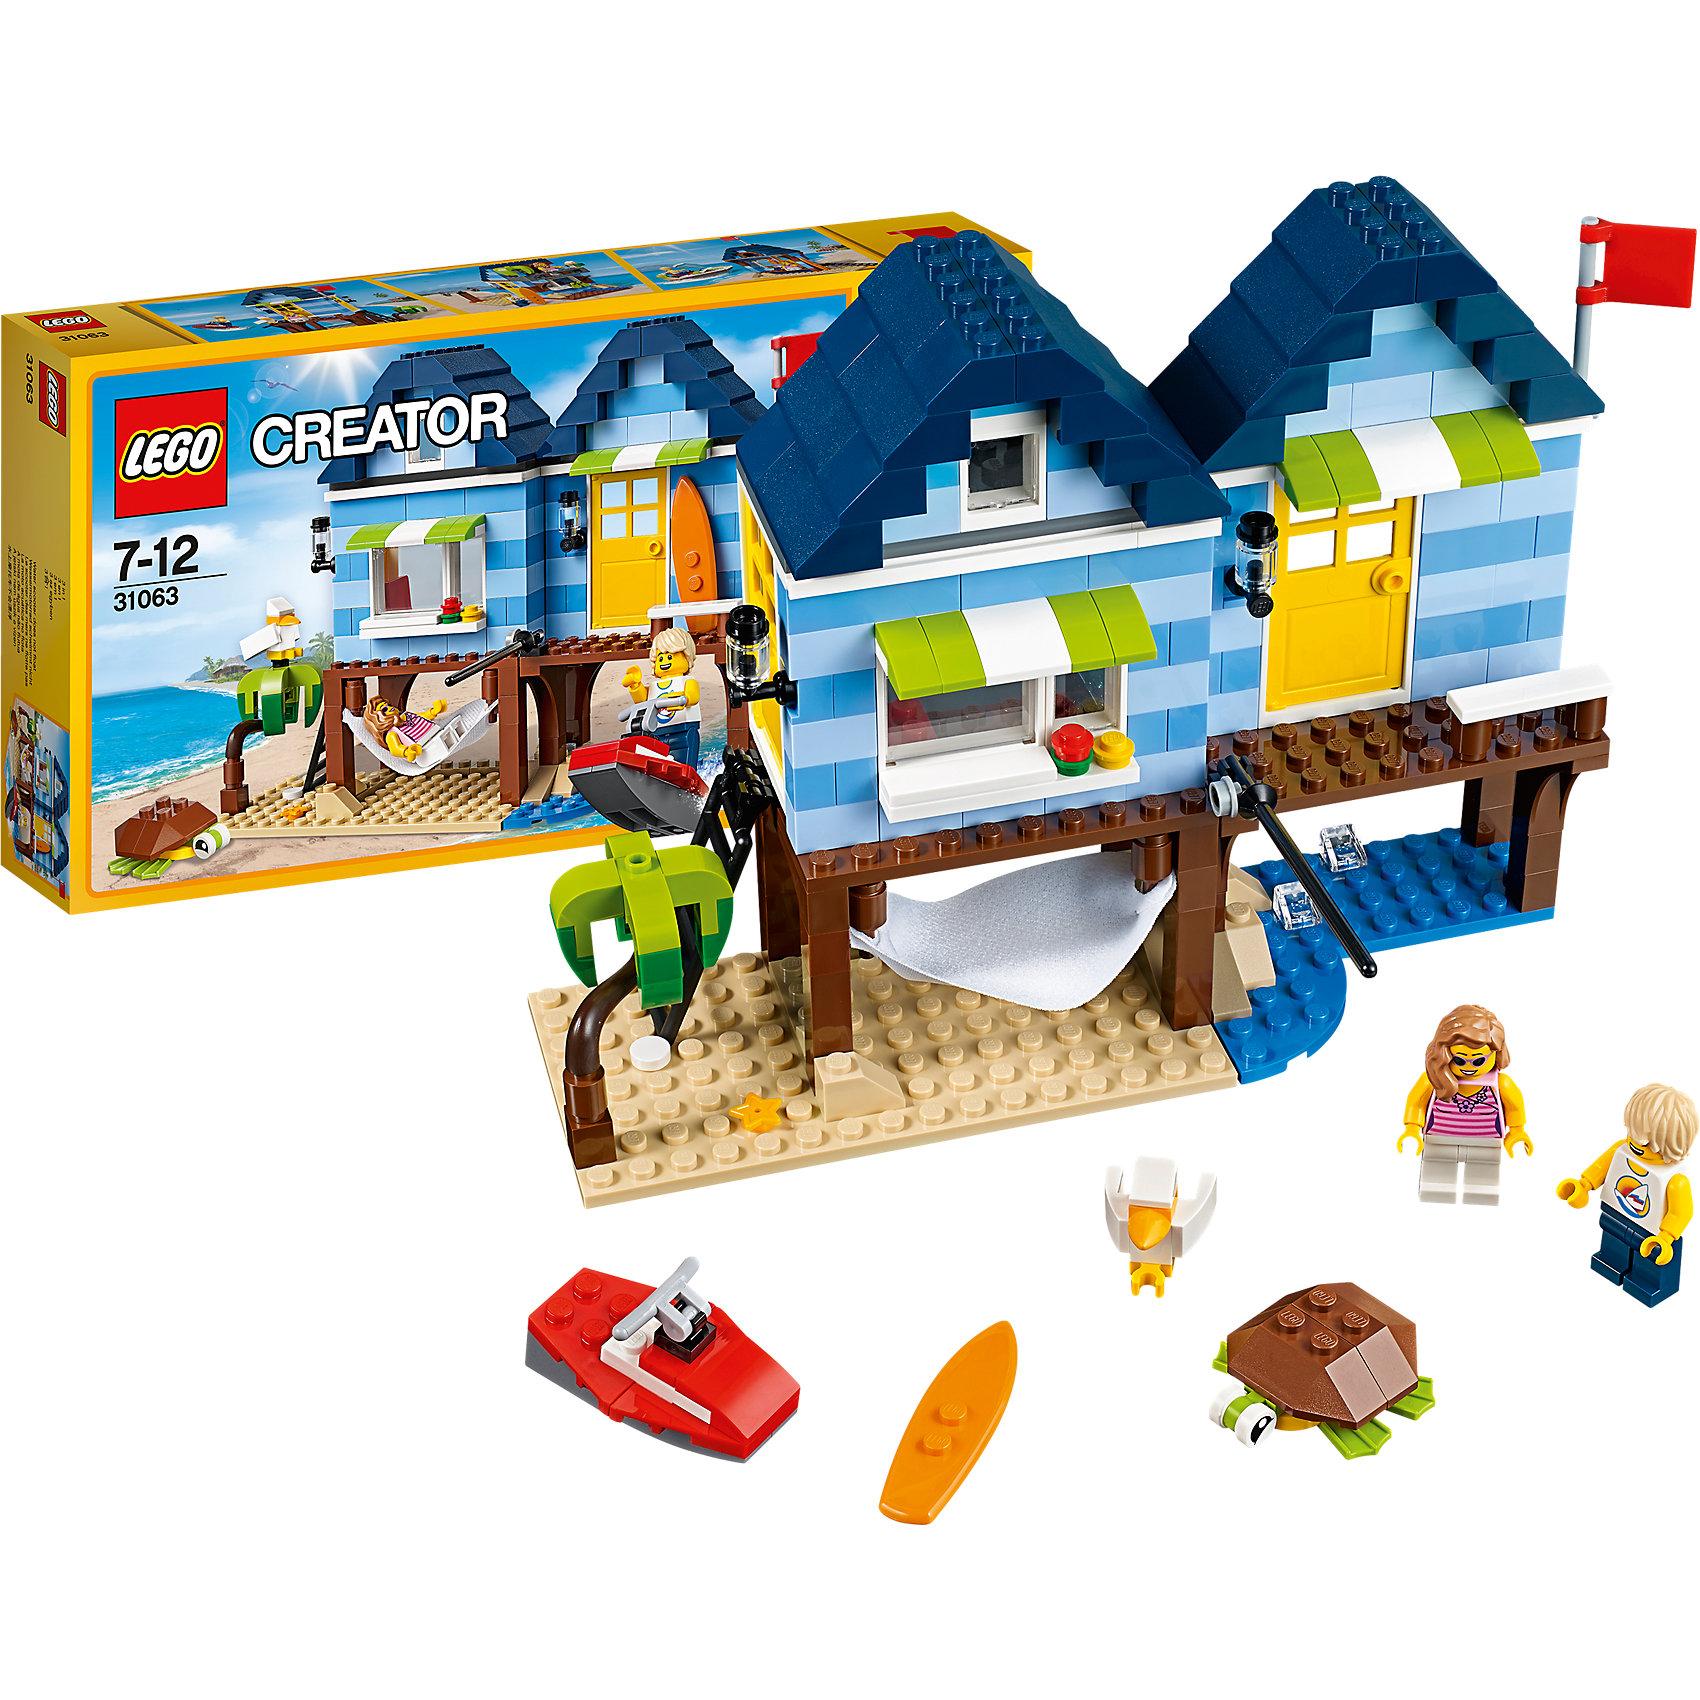 LEGO Creator 31063: Отпуск у моря<br><br>Ширина мм: 354<br>Глубина мм: 192<br>Высота мм: 63<br>Вес г: 547<br>Возраст от месяцев: 84<br>Возраст до месяцев: 144<br>Пол: Унисекс<br>Возраст: Детский<br>SKU: 5002501